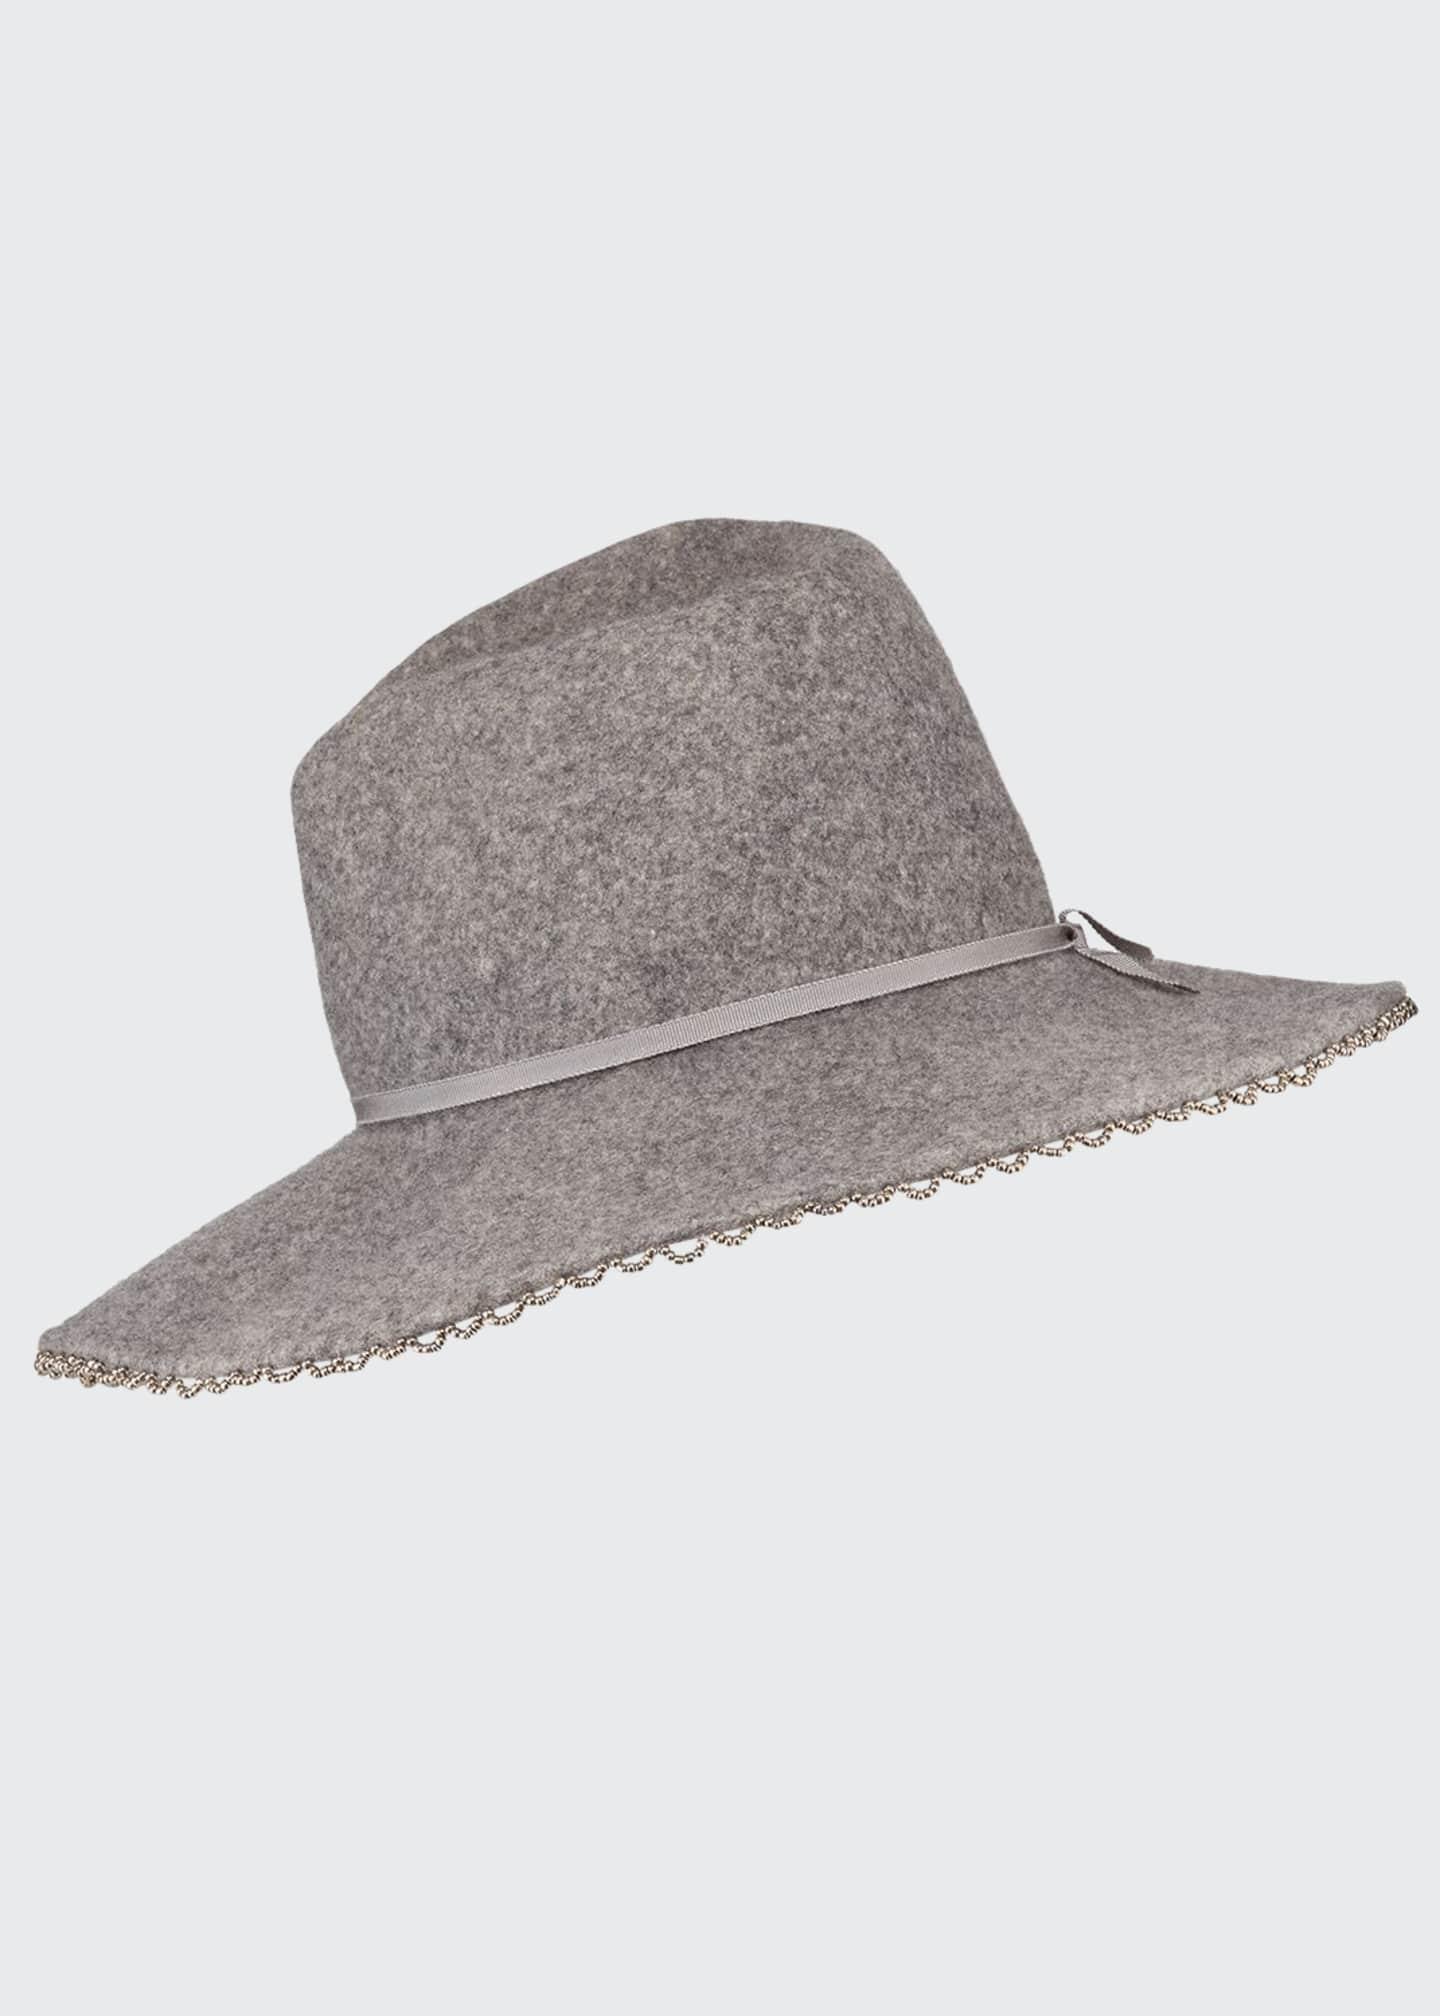 Gigi Burris Drake Wool Felt Fedora Hat w/